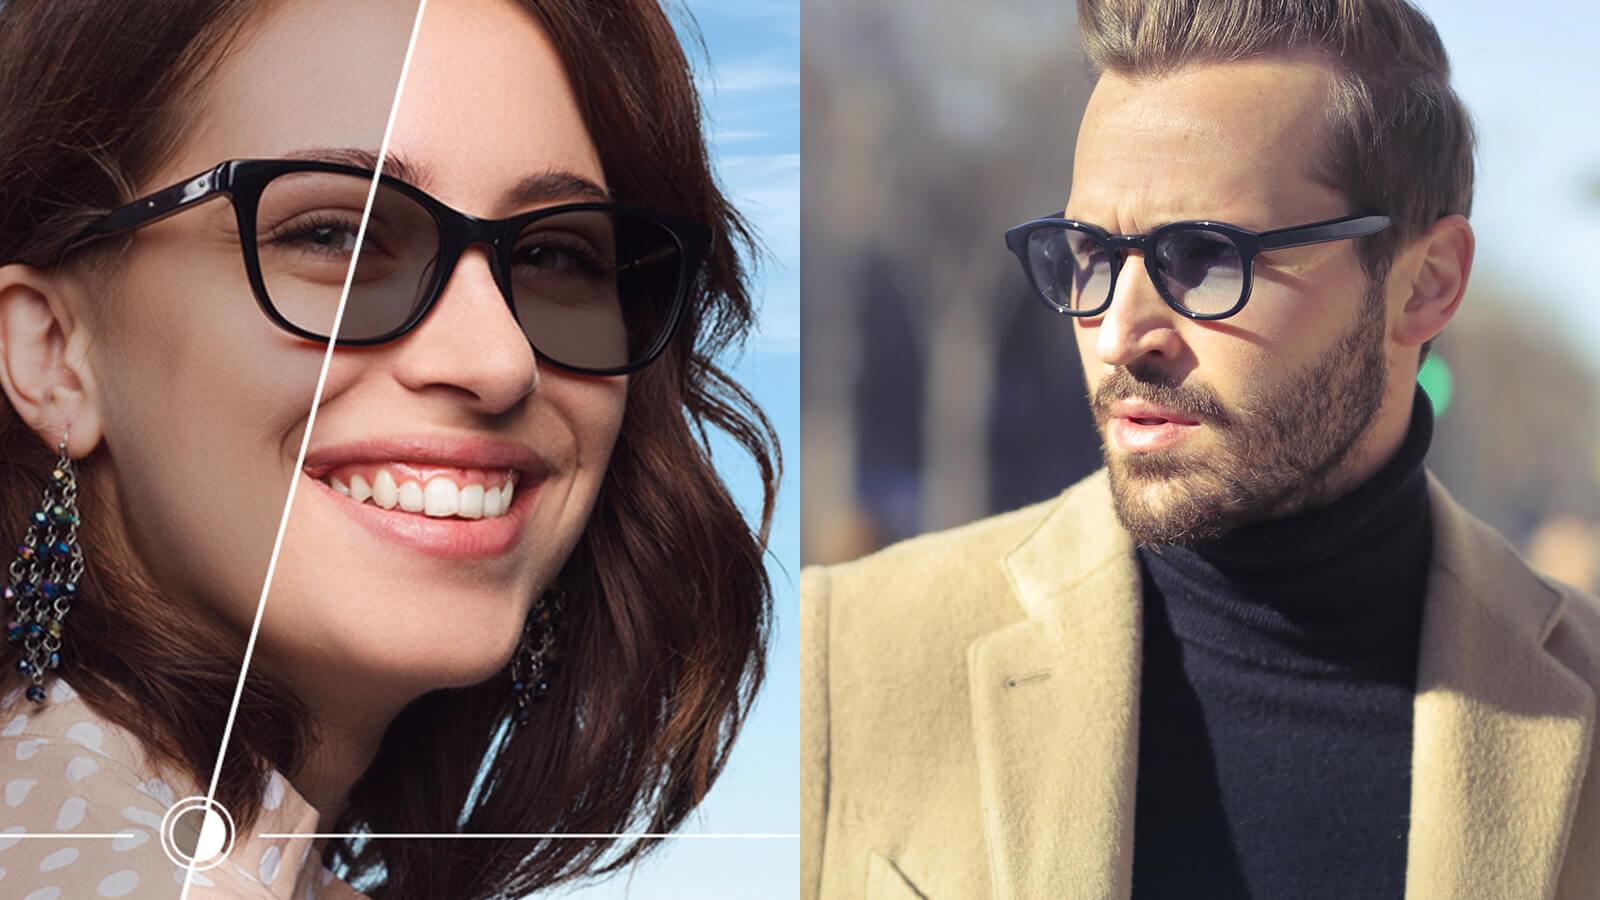 Are prescription sunglasses better than Transition lenses?